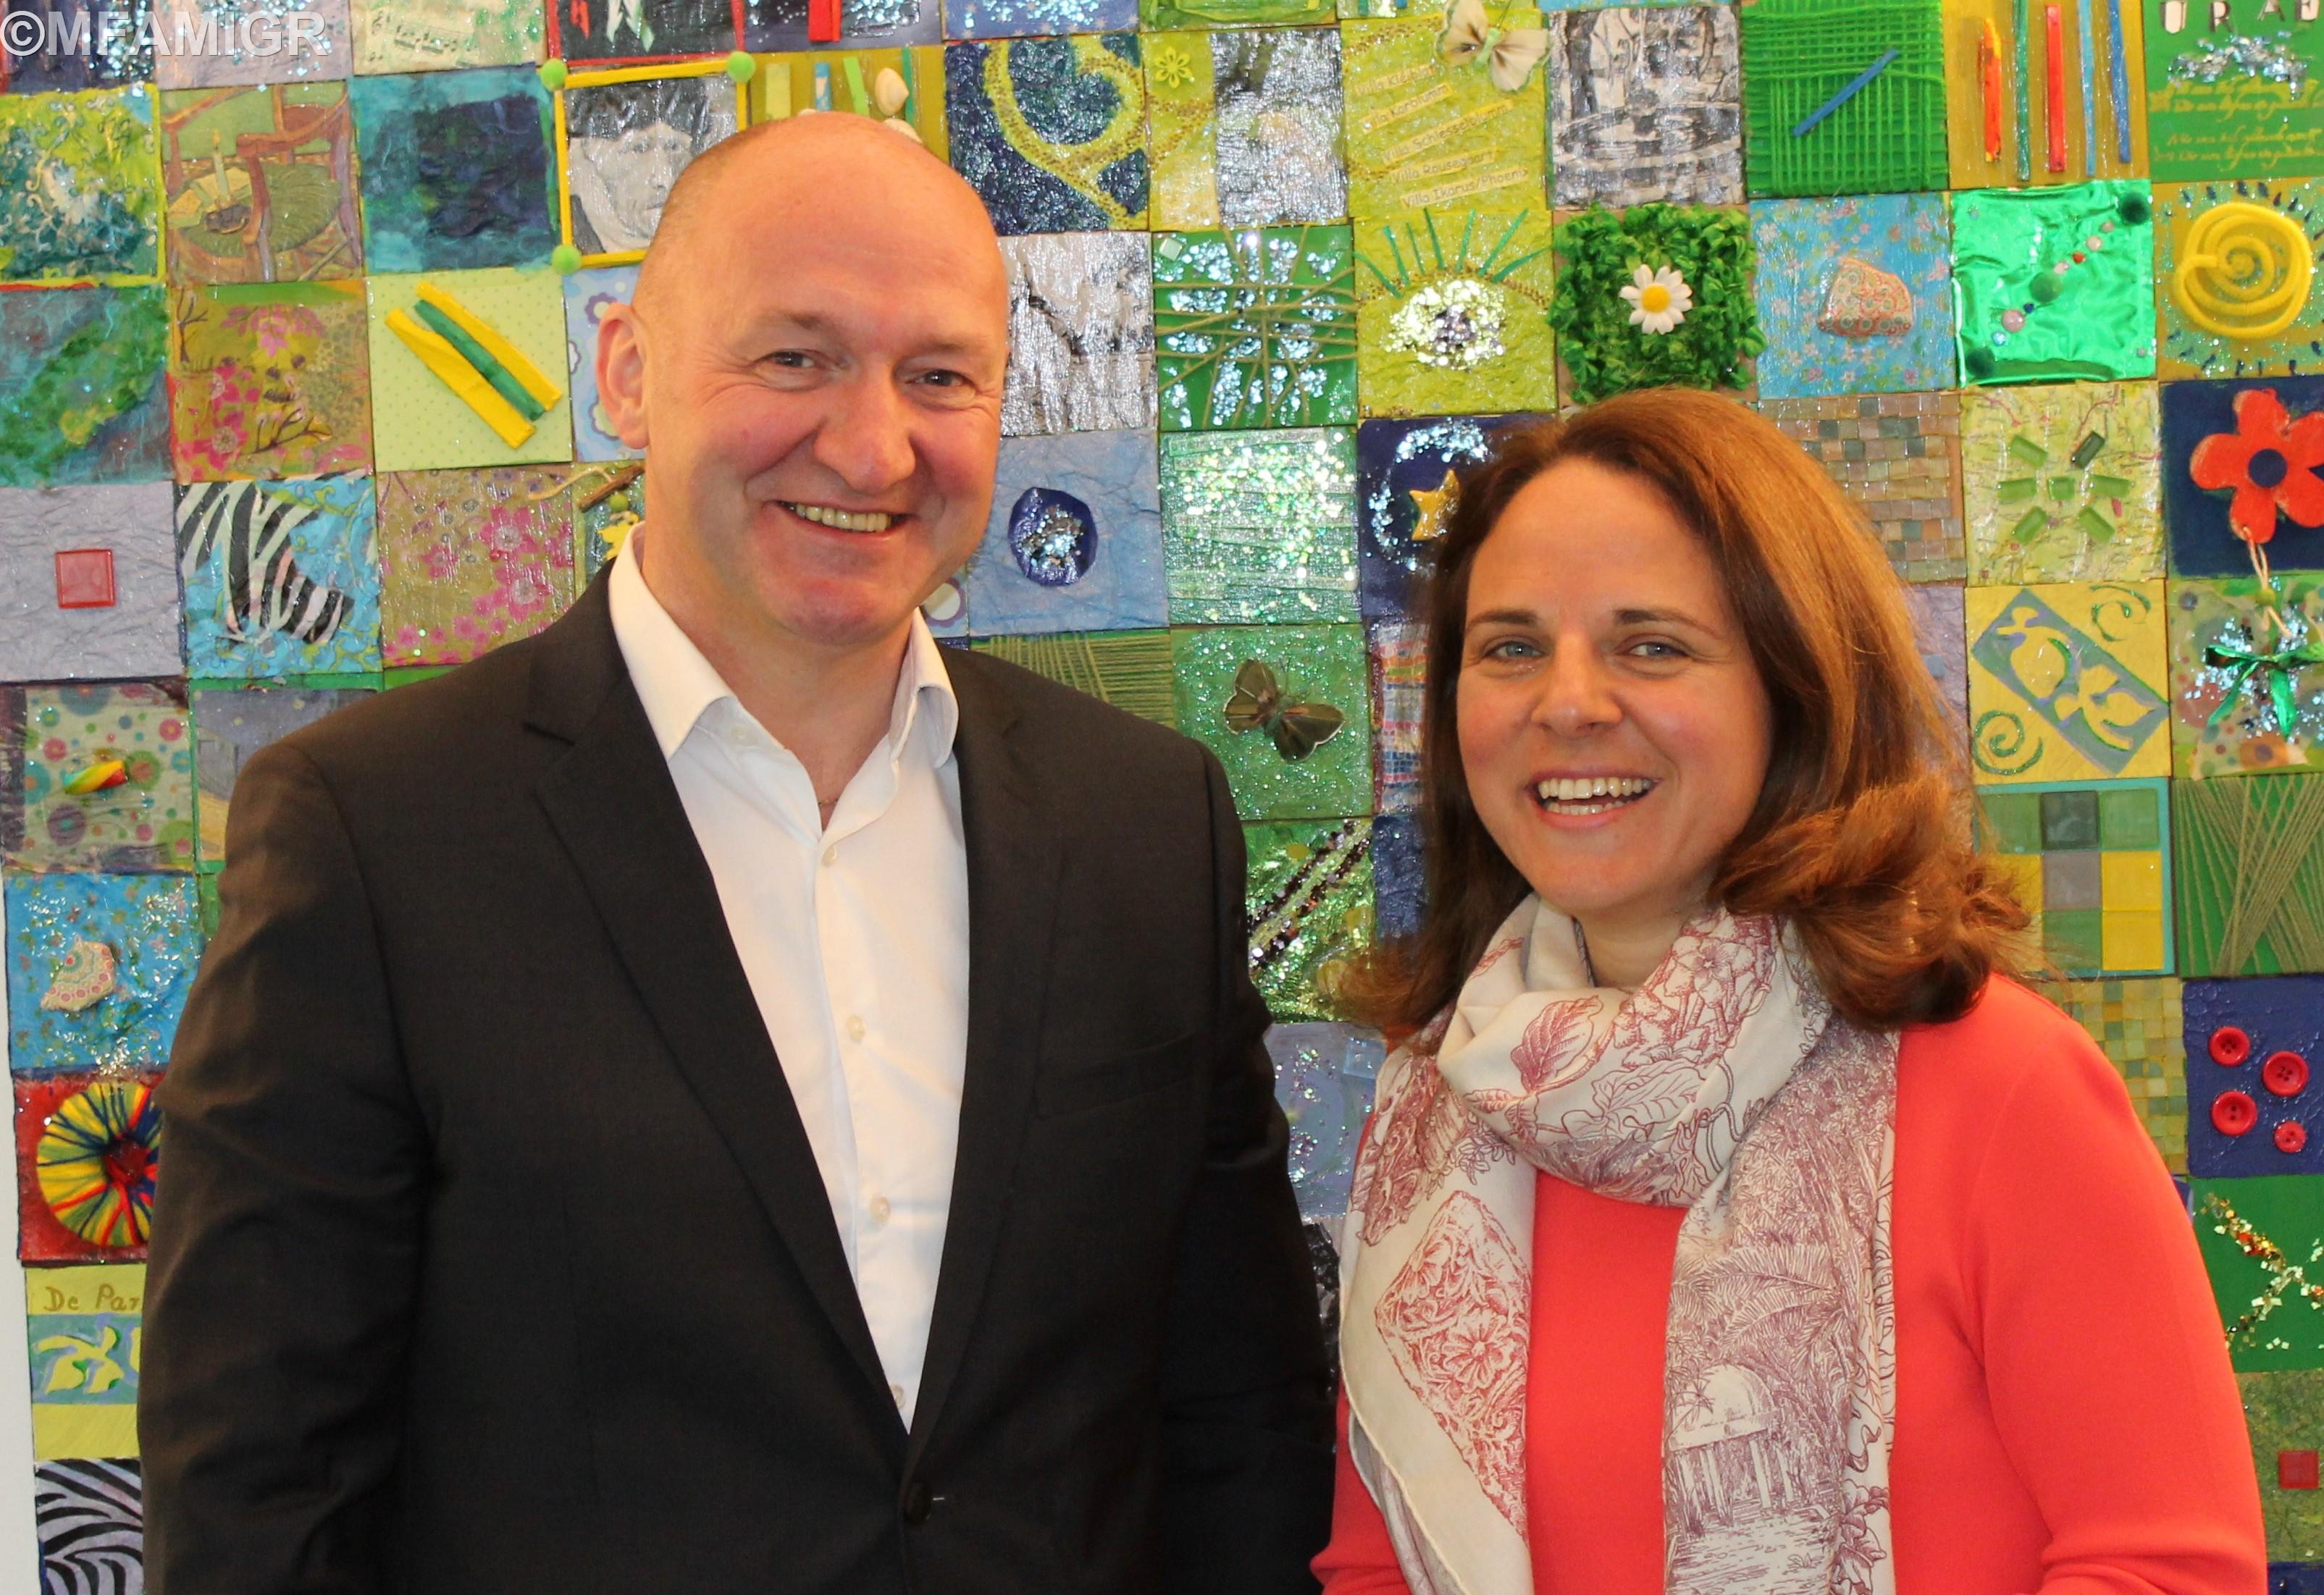 Philippe Ledent et Corinne Cahen